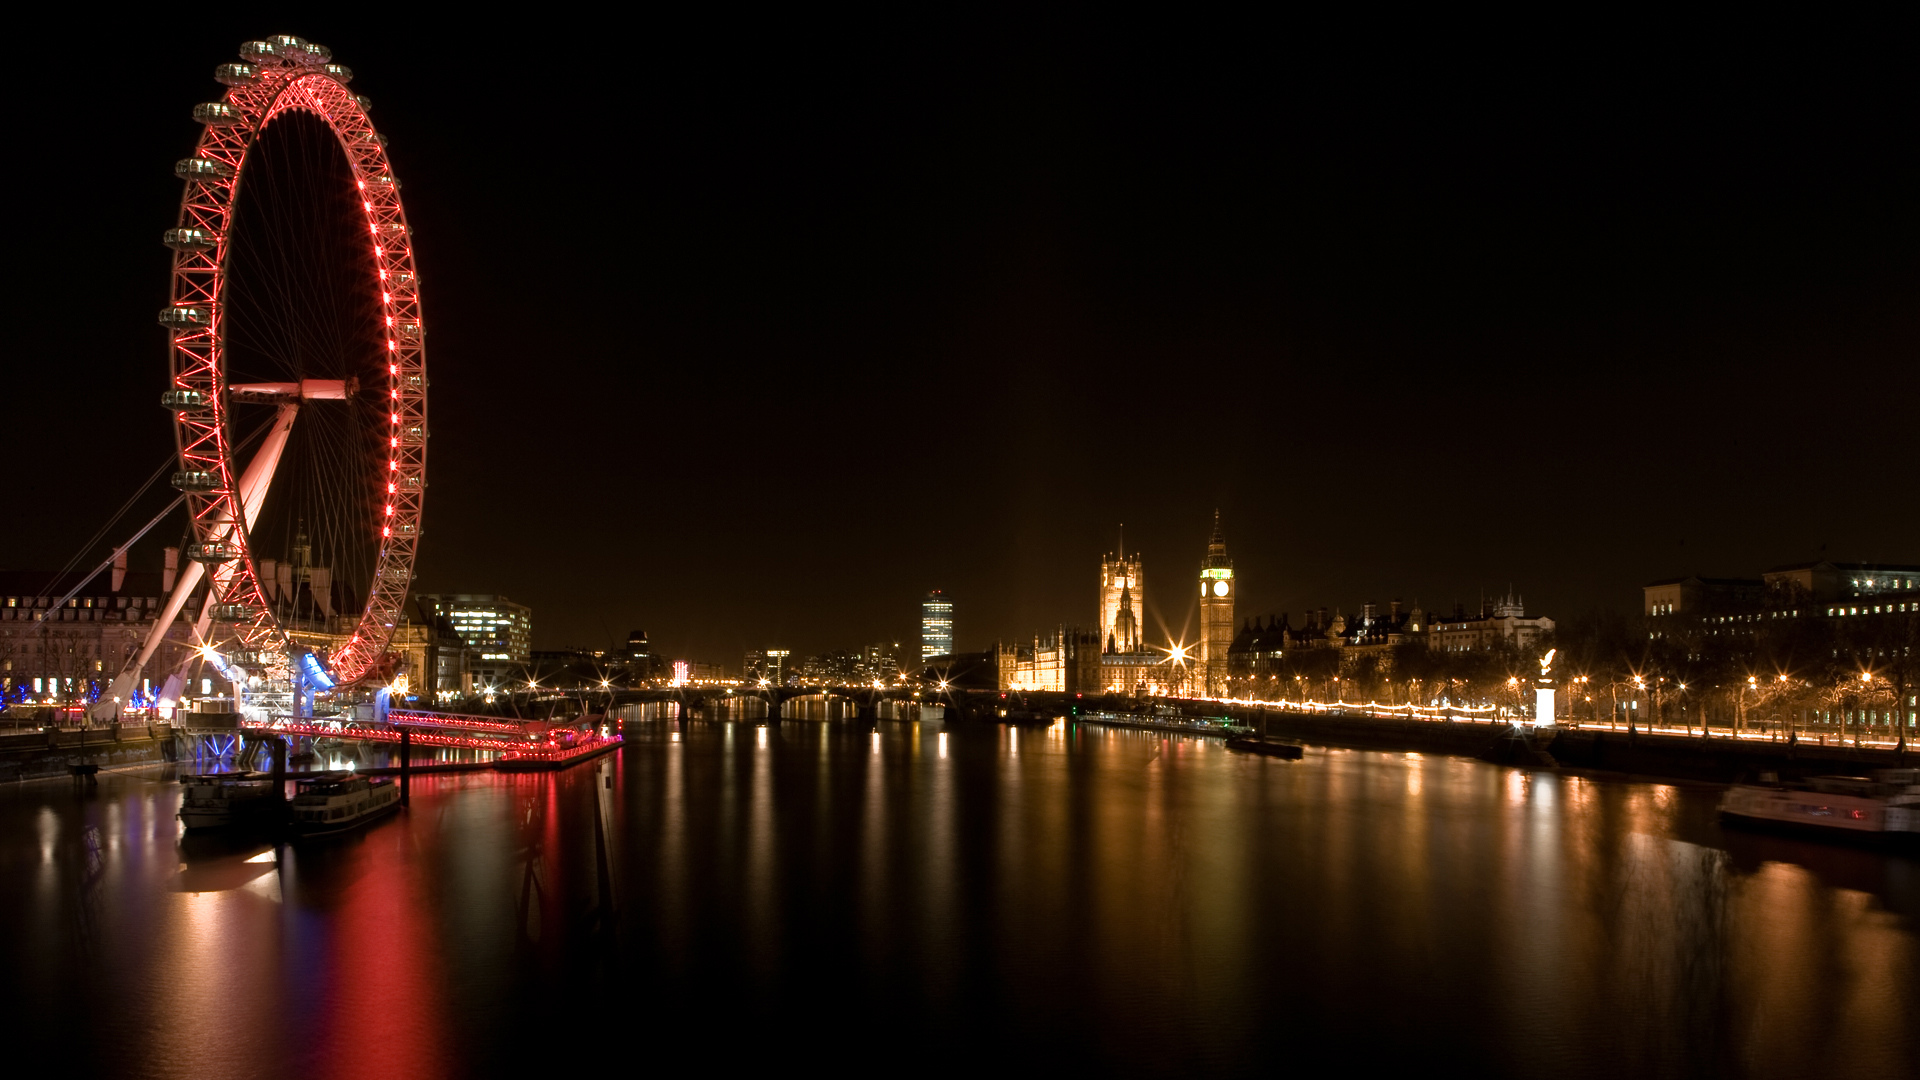 London At Night Wallpaper Wide Screen Wallpaper 1080p2K4K 1920x1080